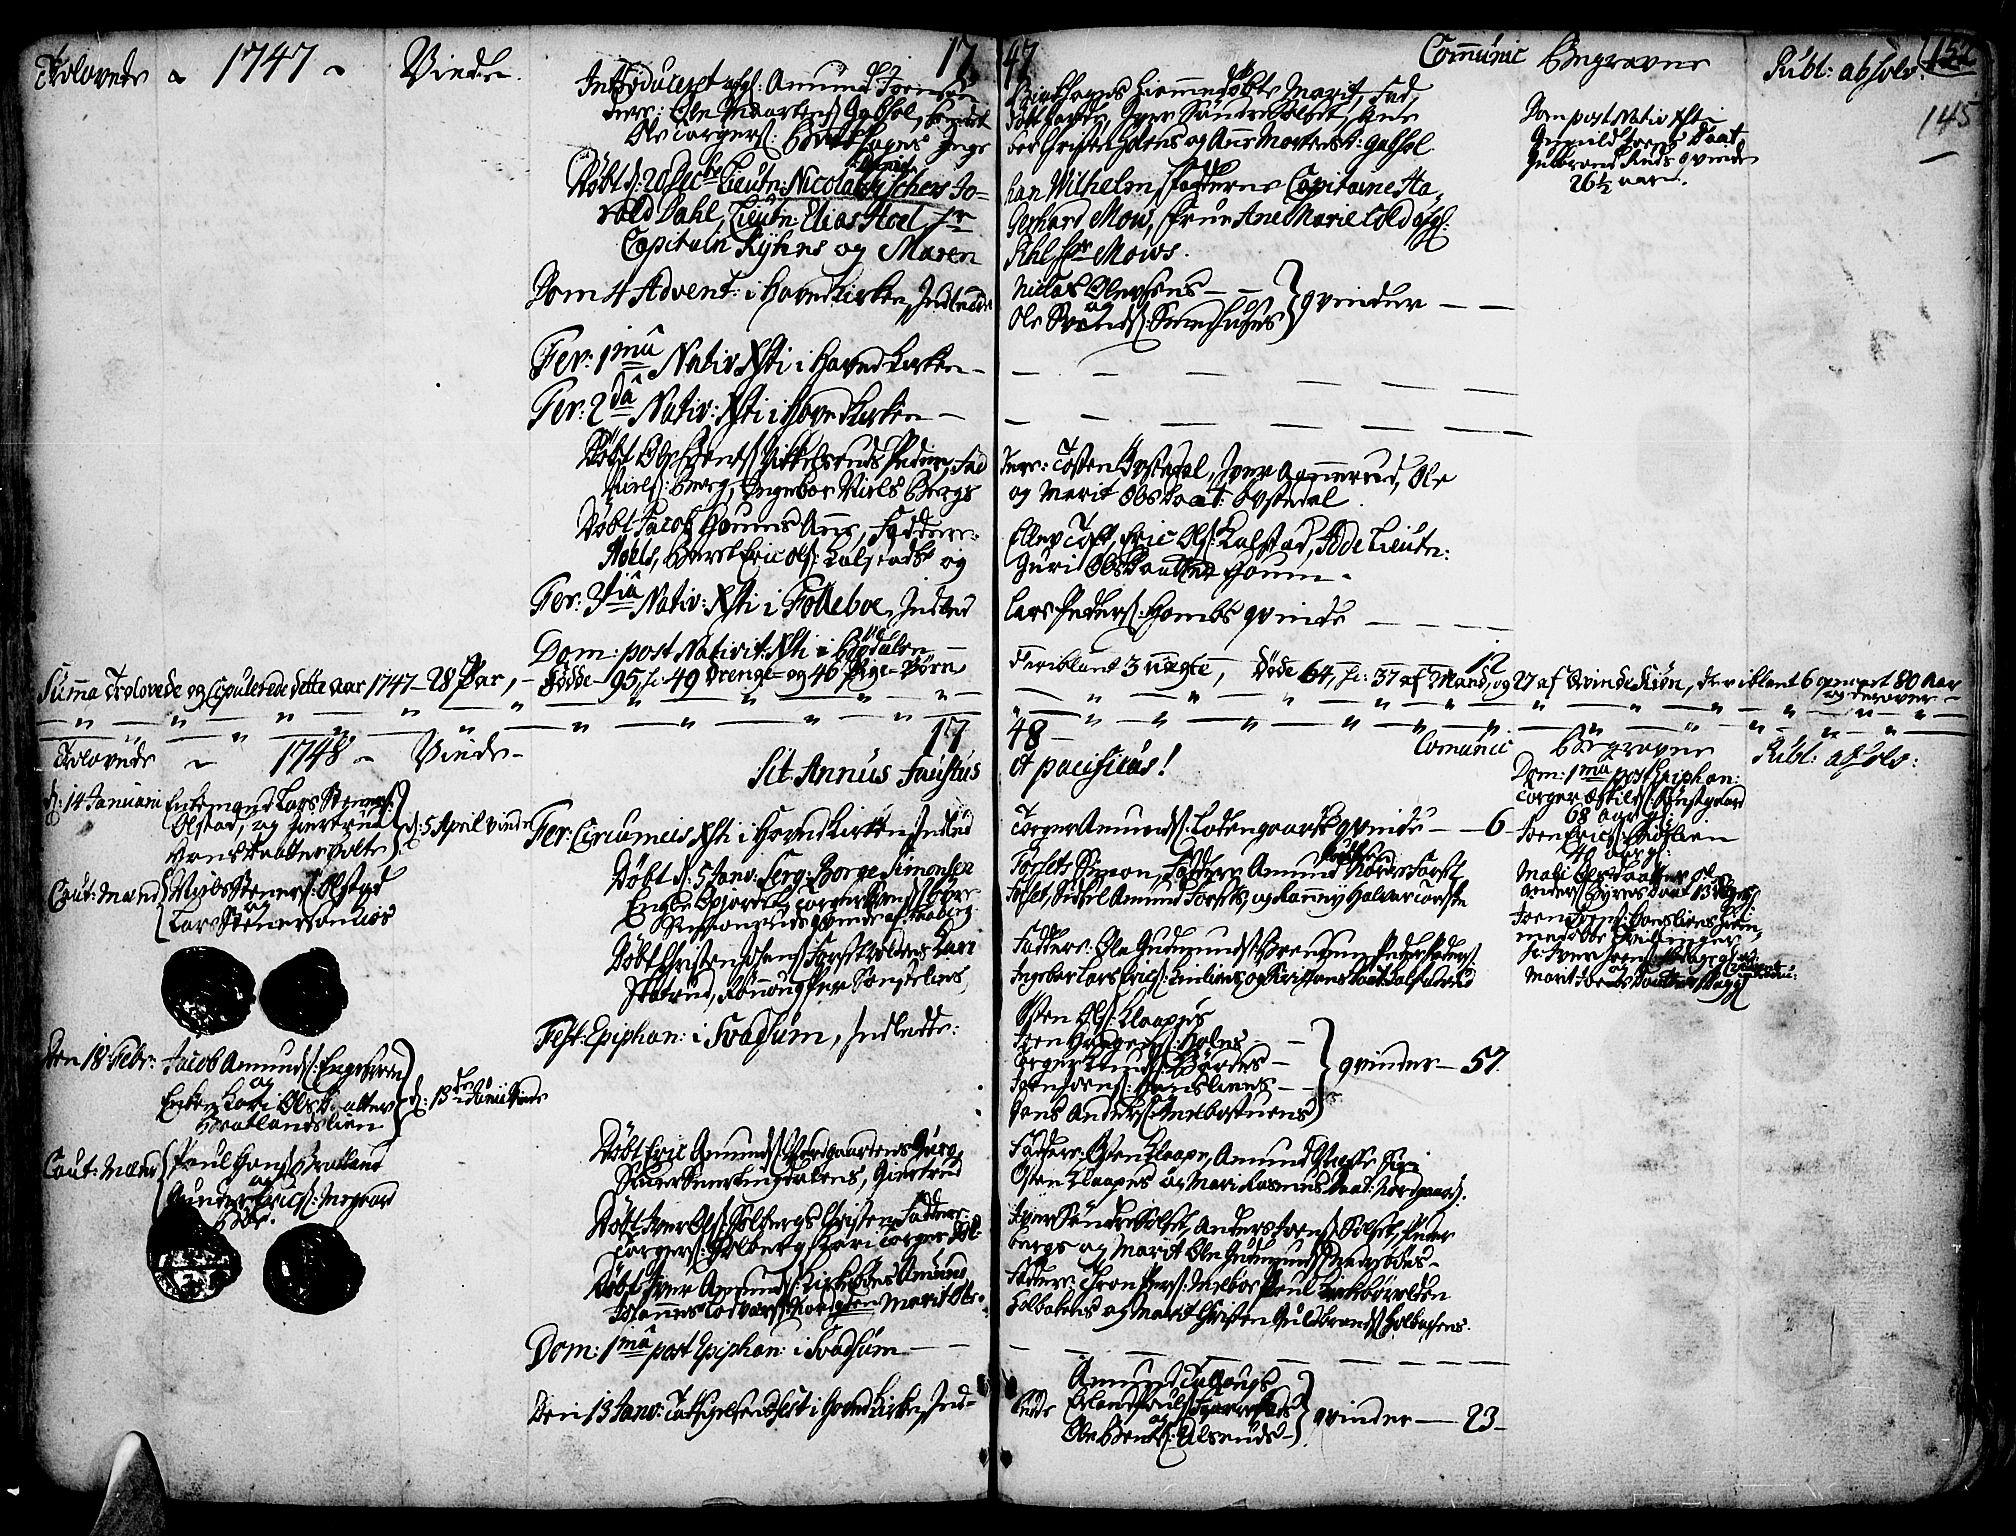 SAH, Gausdal prestekontor, Ministerialbok nr. 2, 1729-1757, s. 145